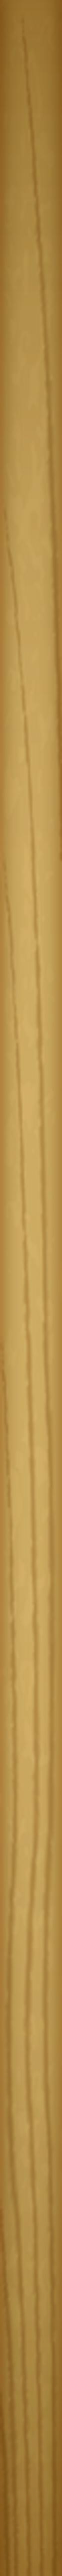 "Solid Teak Lumber Plank-1/2 x 1-3/4 x 72"" (6 feet) Part #60813"